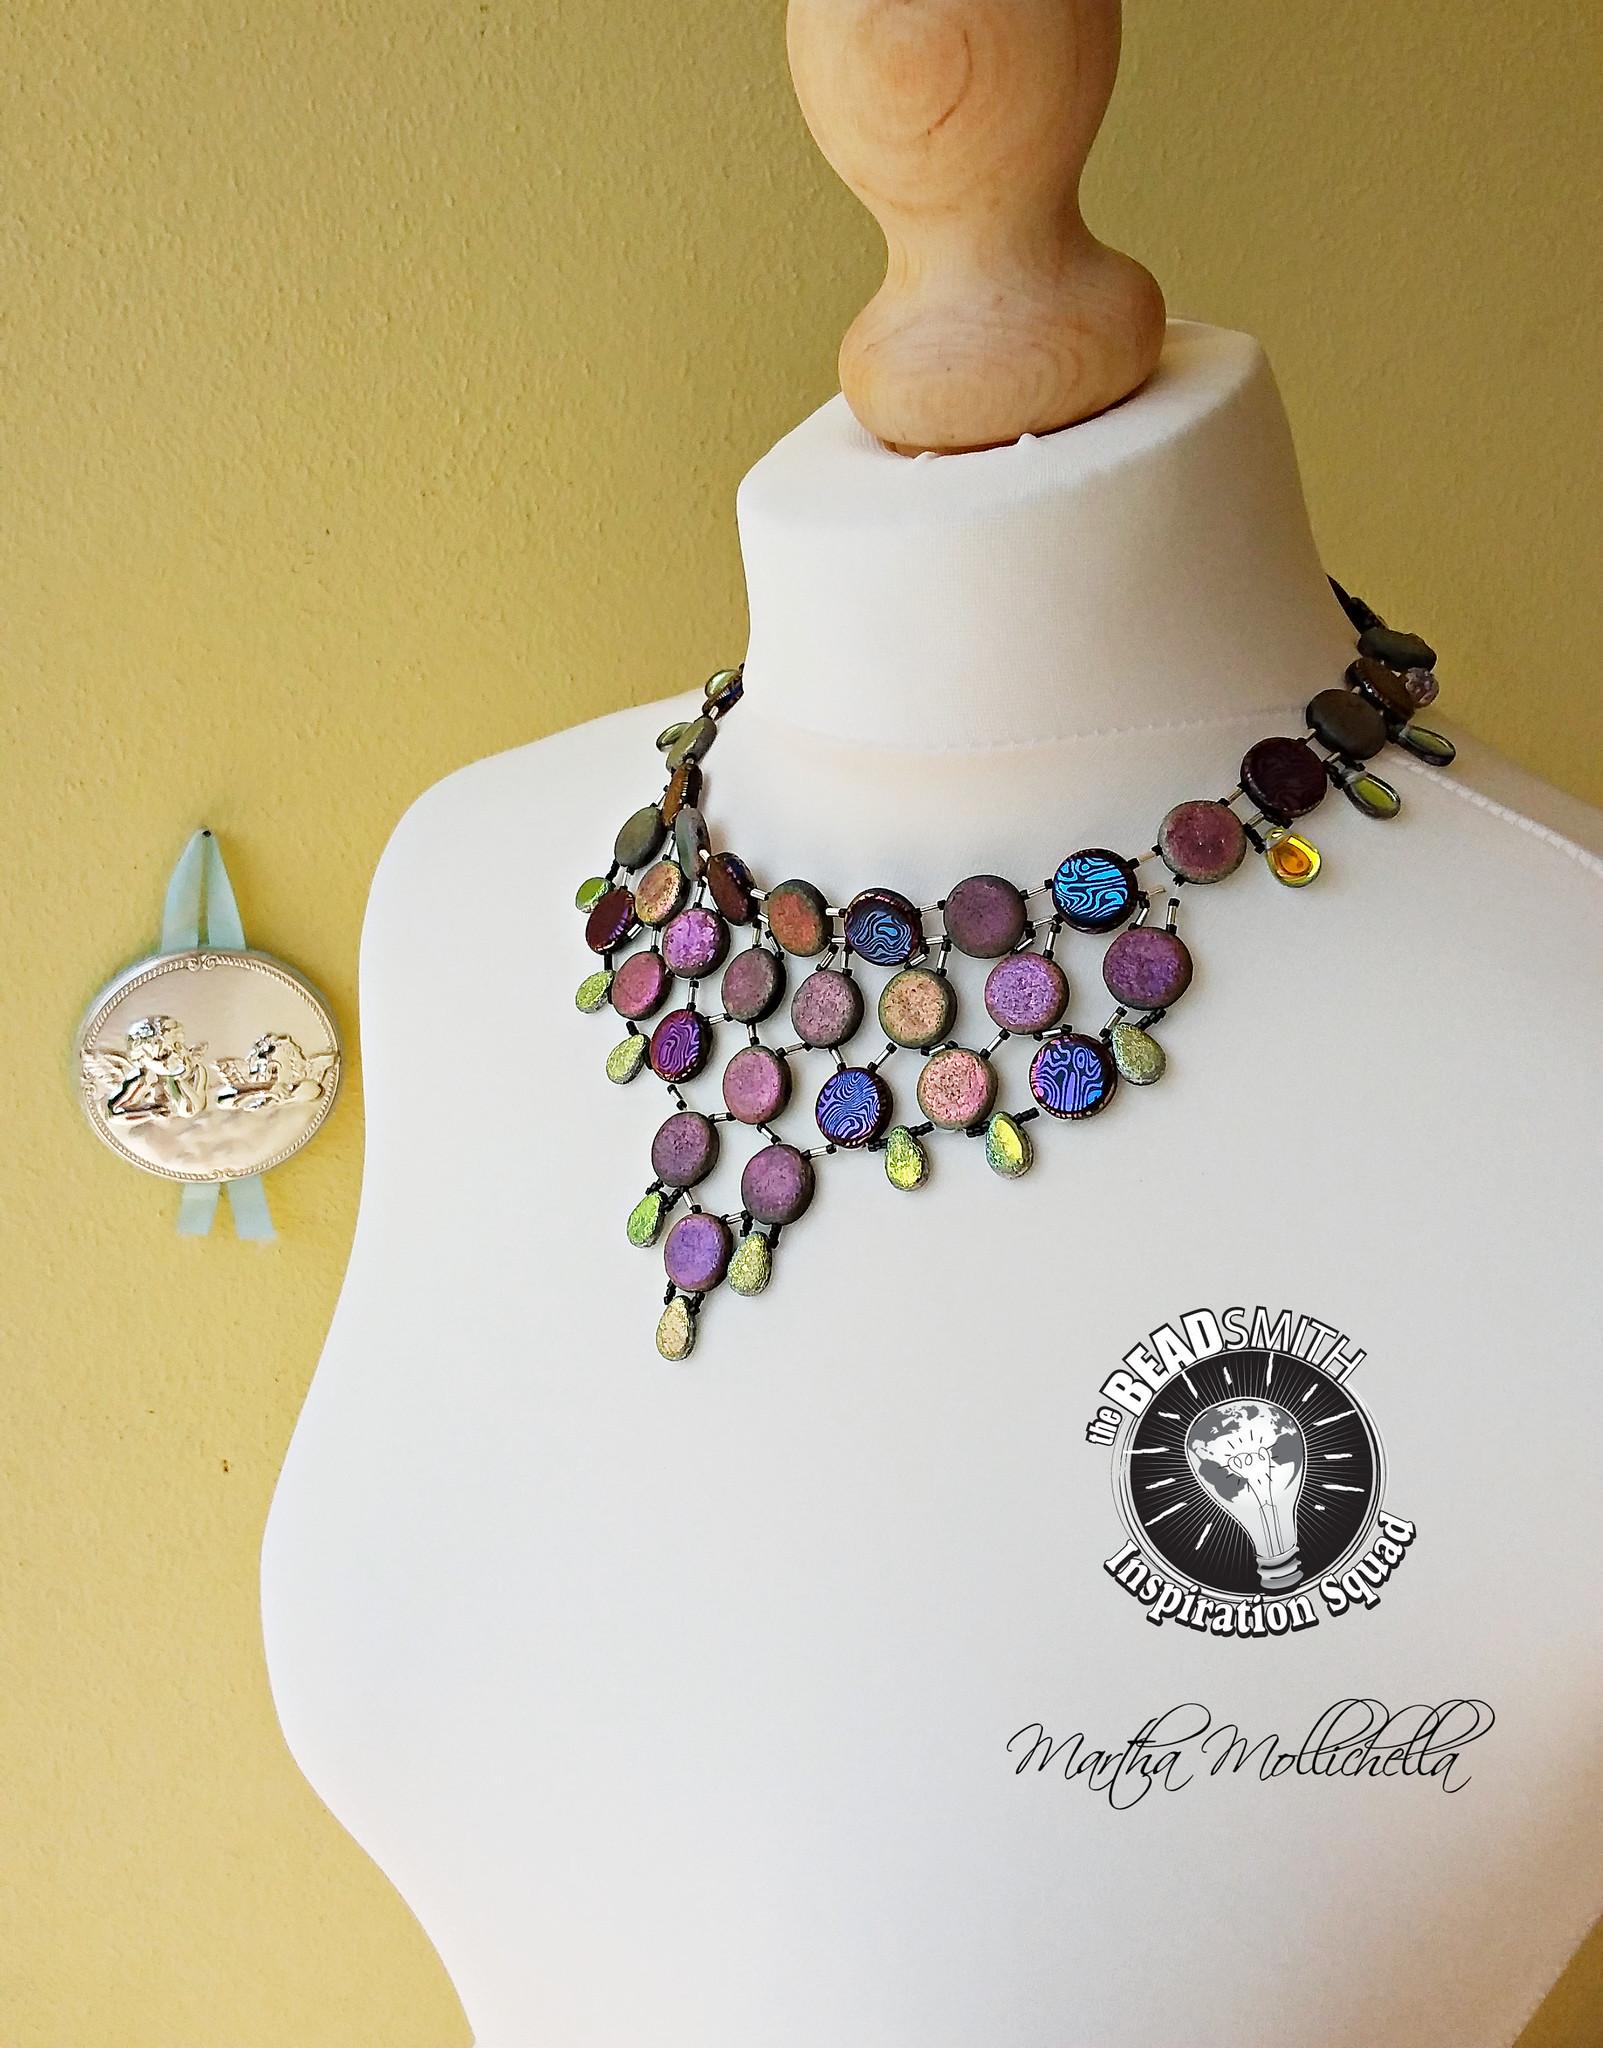 Martha Mollichella Inspiration Squad The Beadsmith